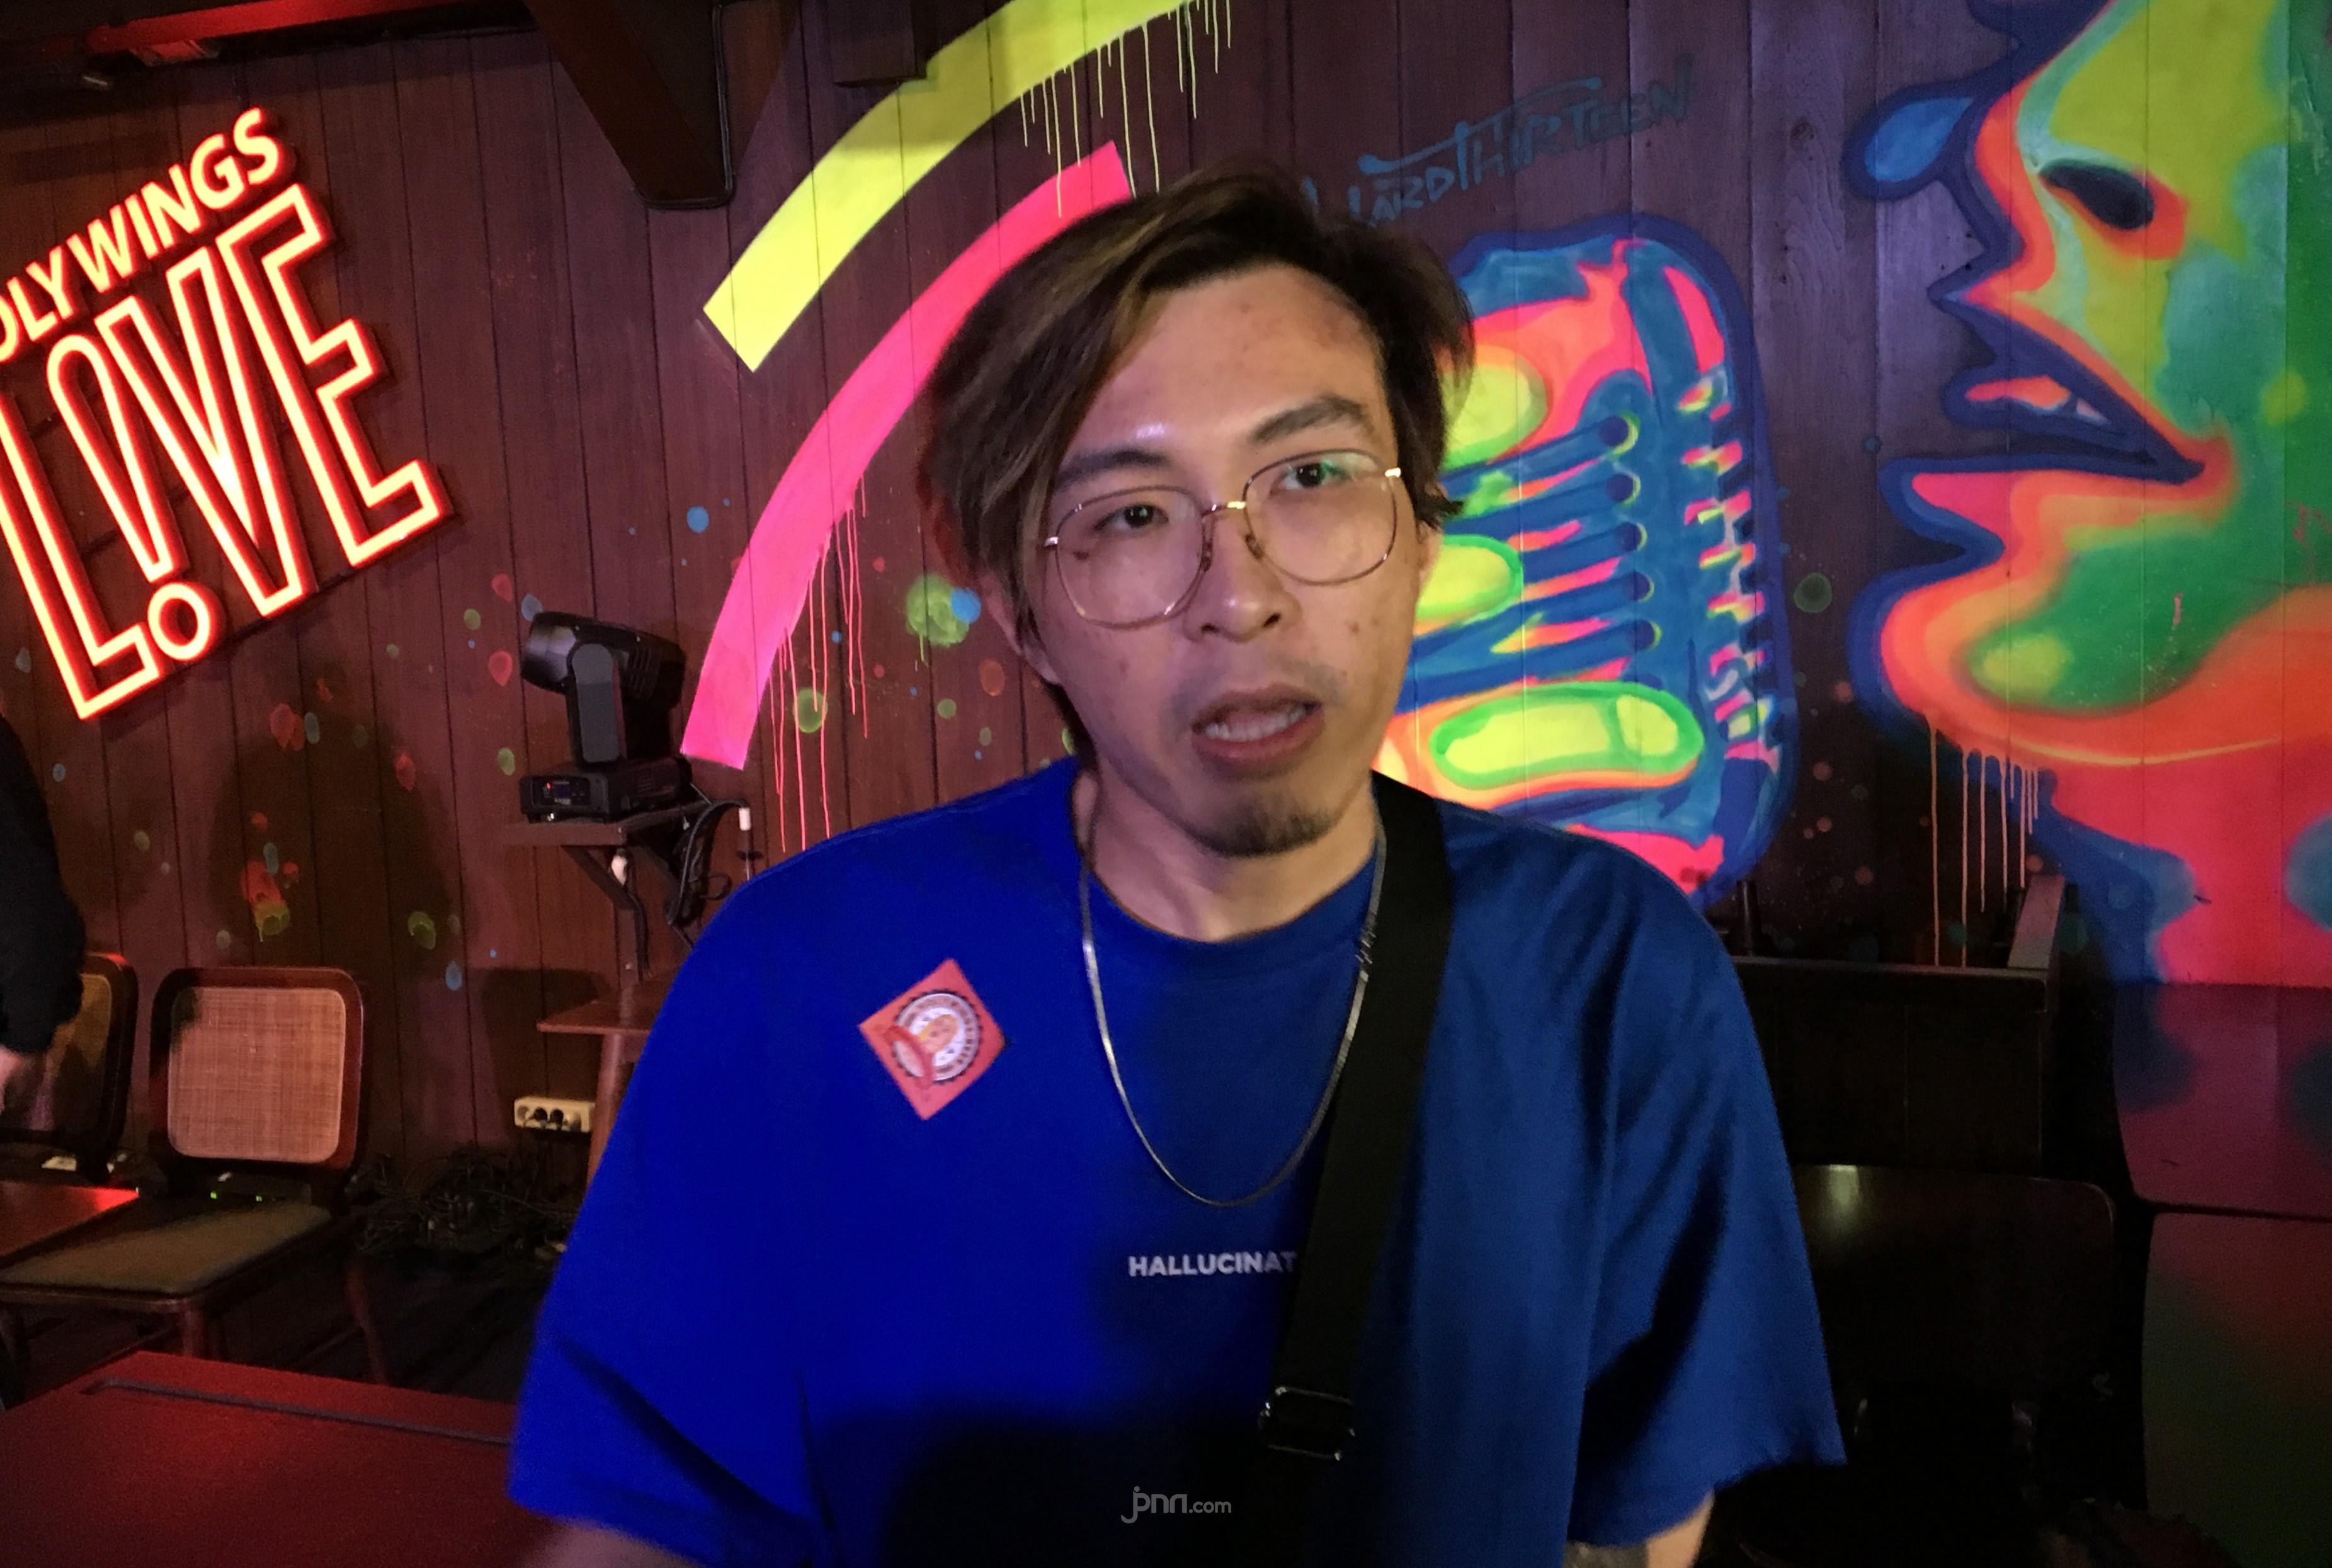 Usai Disemprot Melly Goeslaw, dr Tirta: Sumpah Takut Banget, Saya Masih Pengin Hidup - JPNN.com